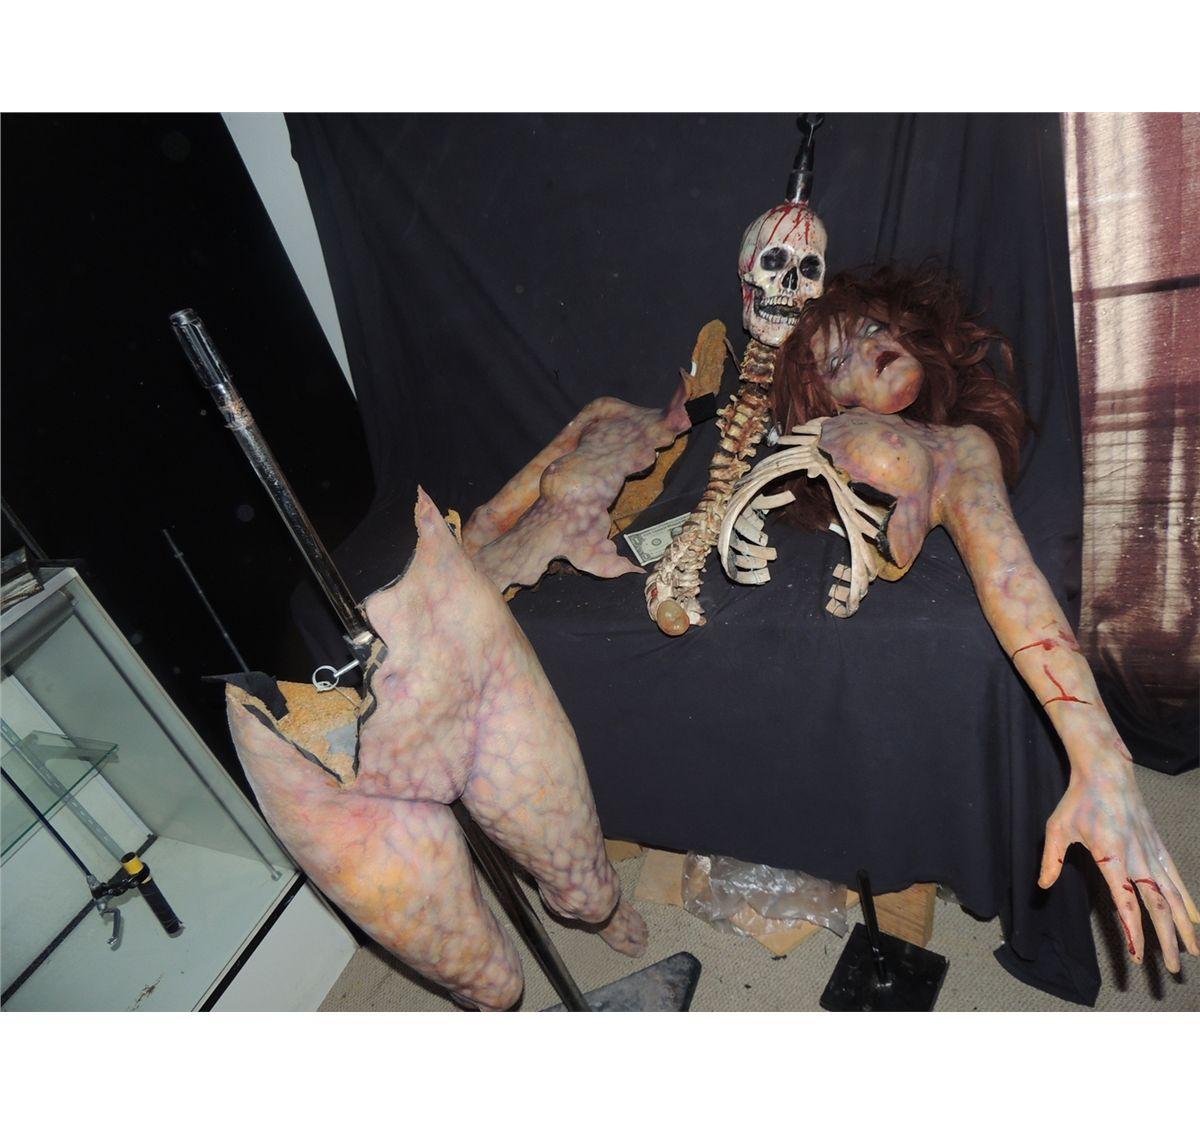 marilyn manson nude photos